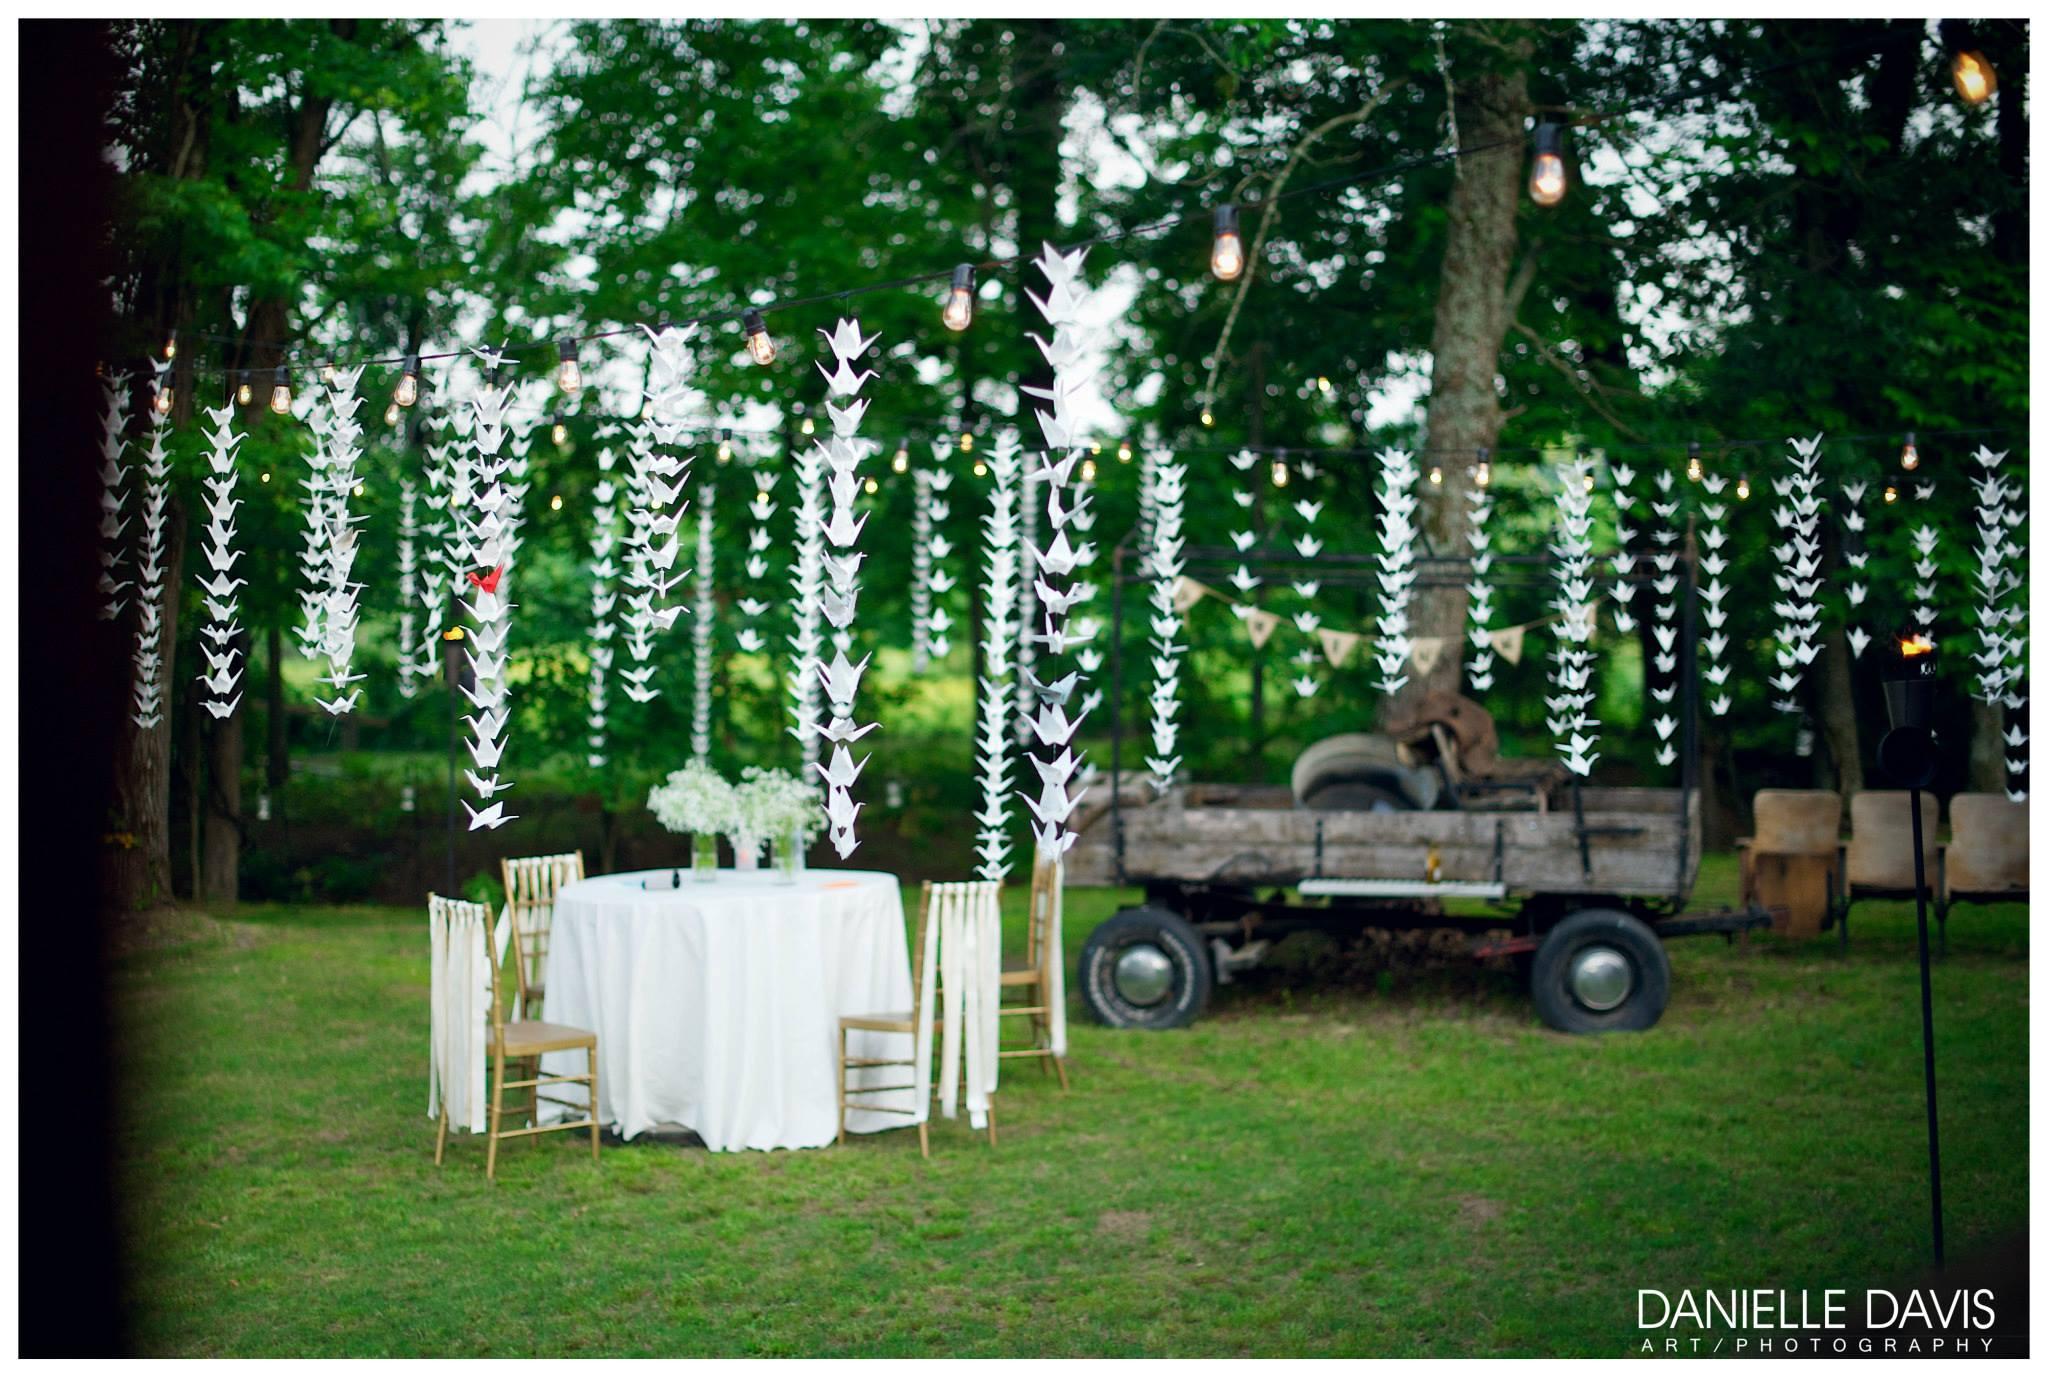 Danielle Davis Art/Photography  , from  Ani + Nathan  's wedding at The Barn